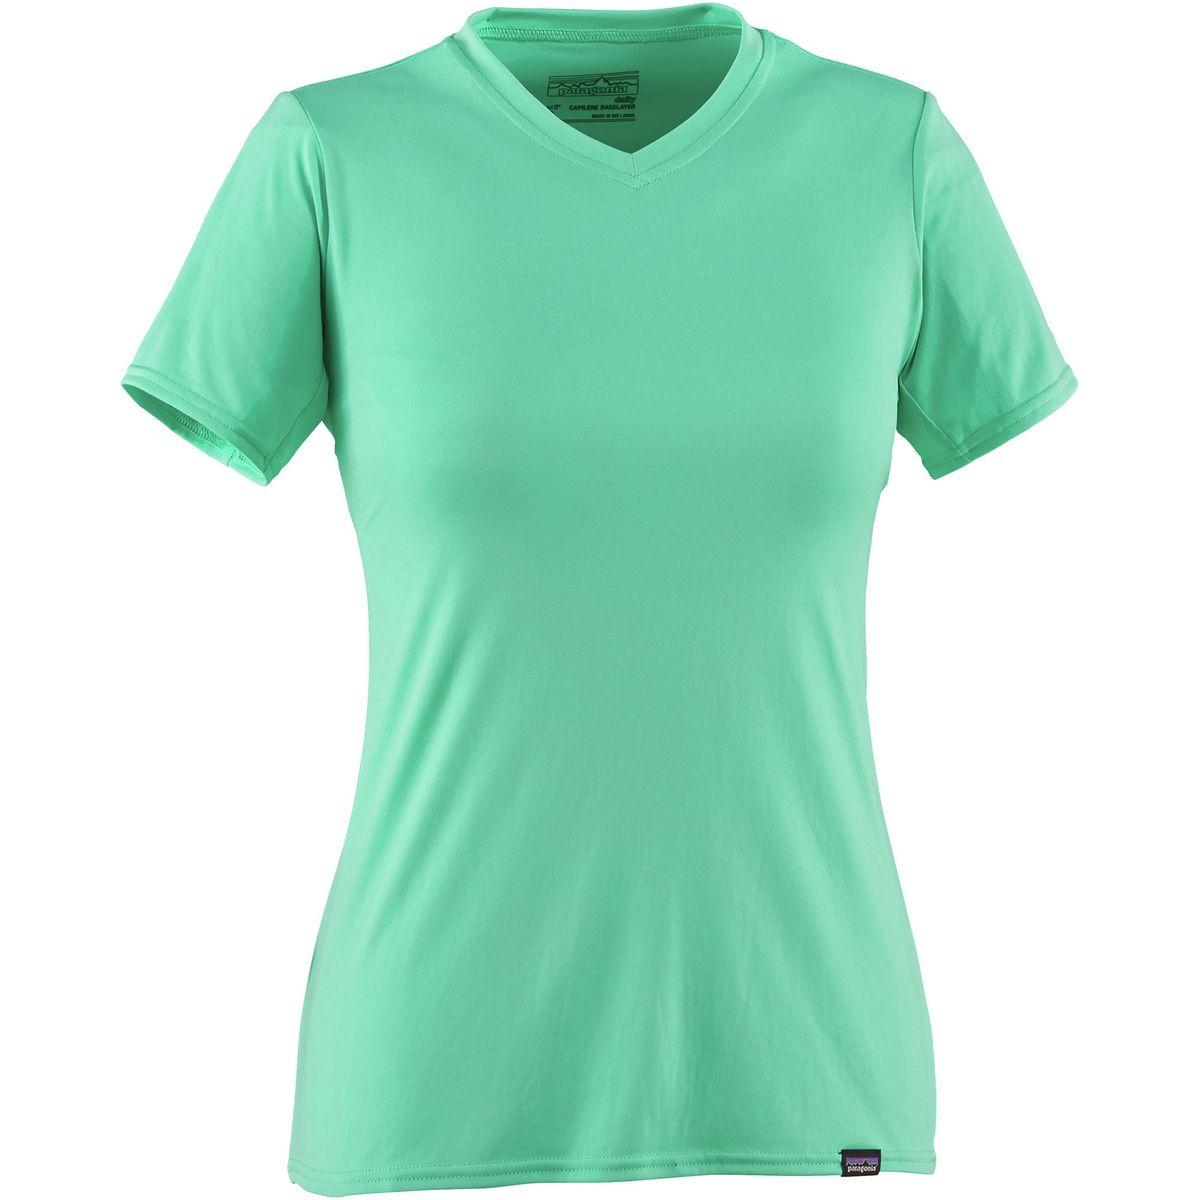 Patagonia Capilene Daily T-Shirt - Women